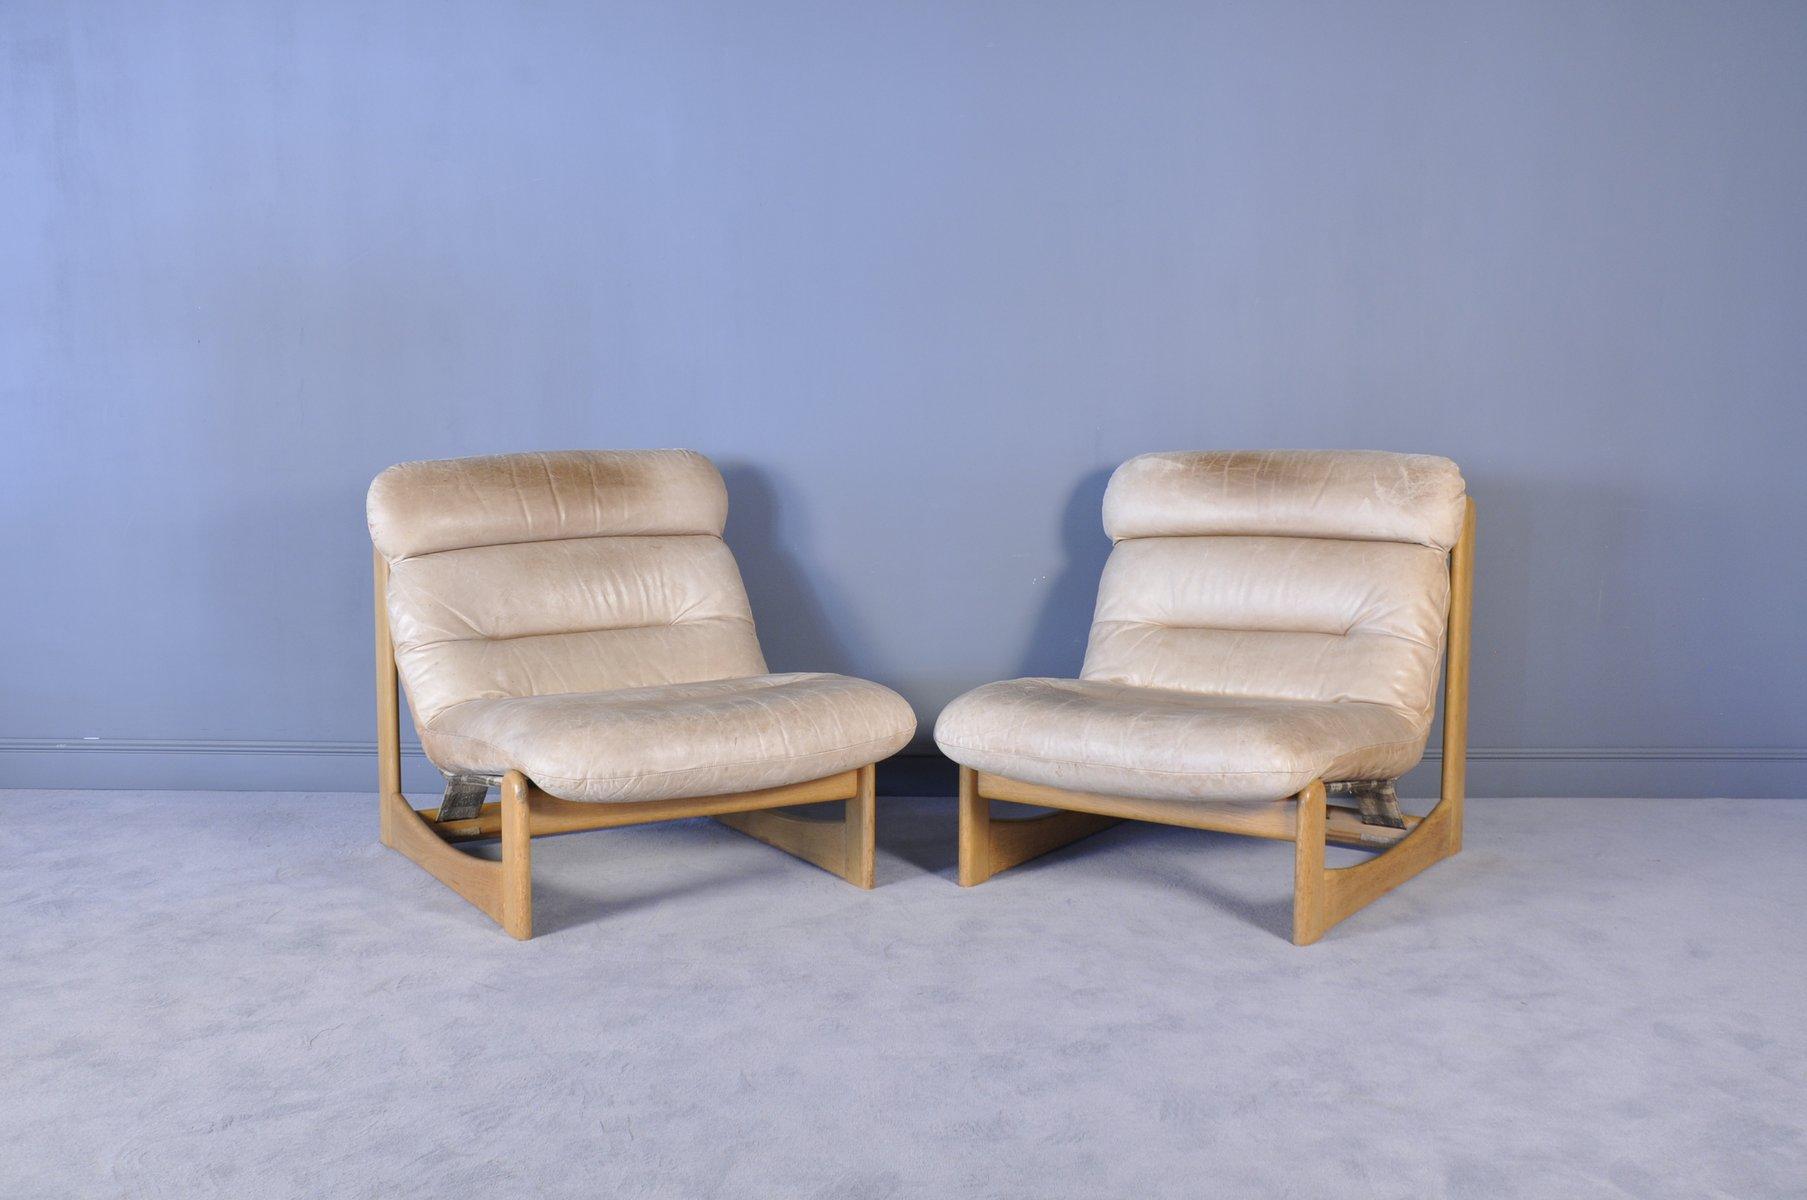 mid century modern ledersessel 2er set bei pamono kaufen. Black Bedroom Furniture Sets. Home Design Ideas